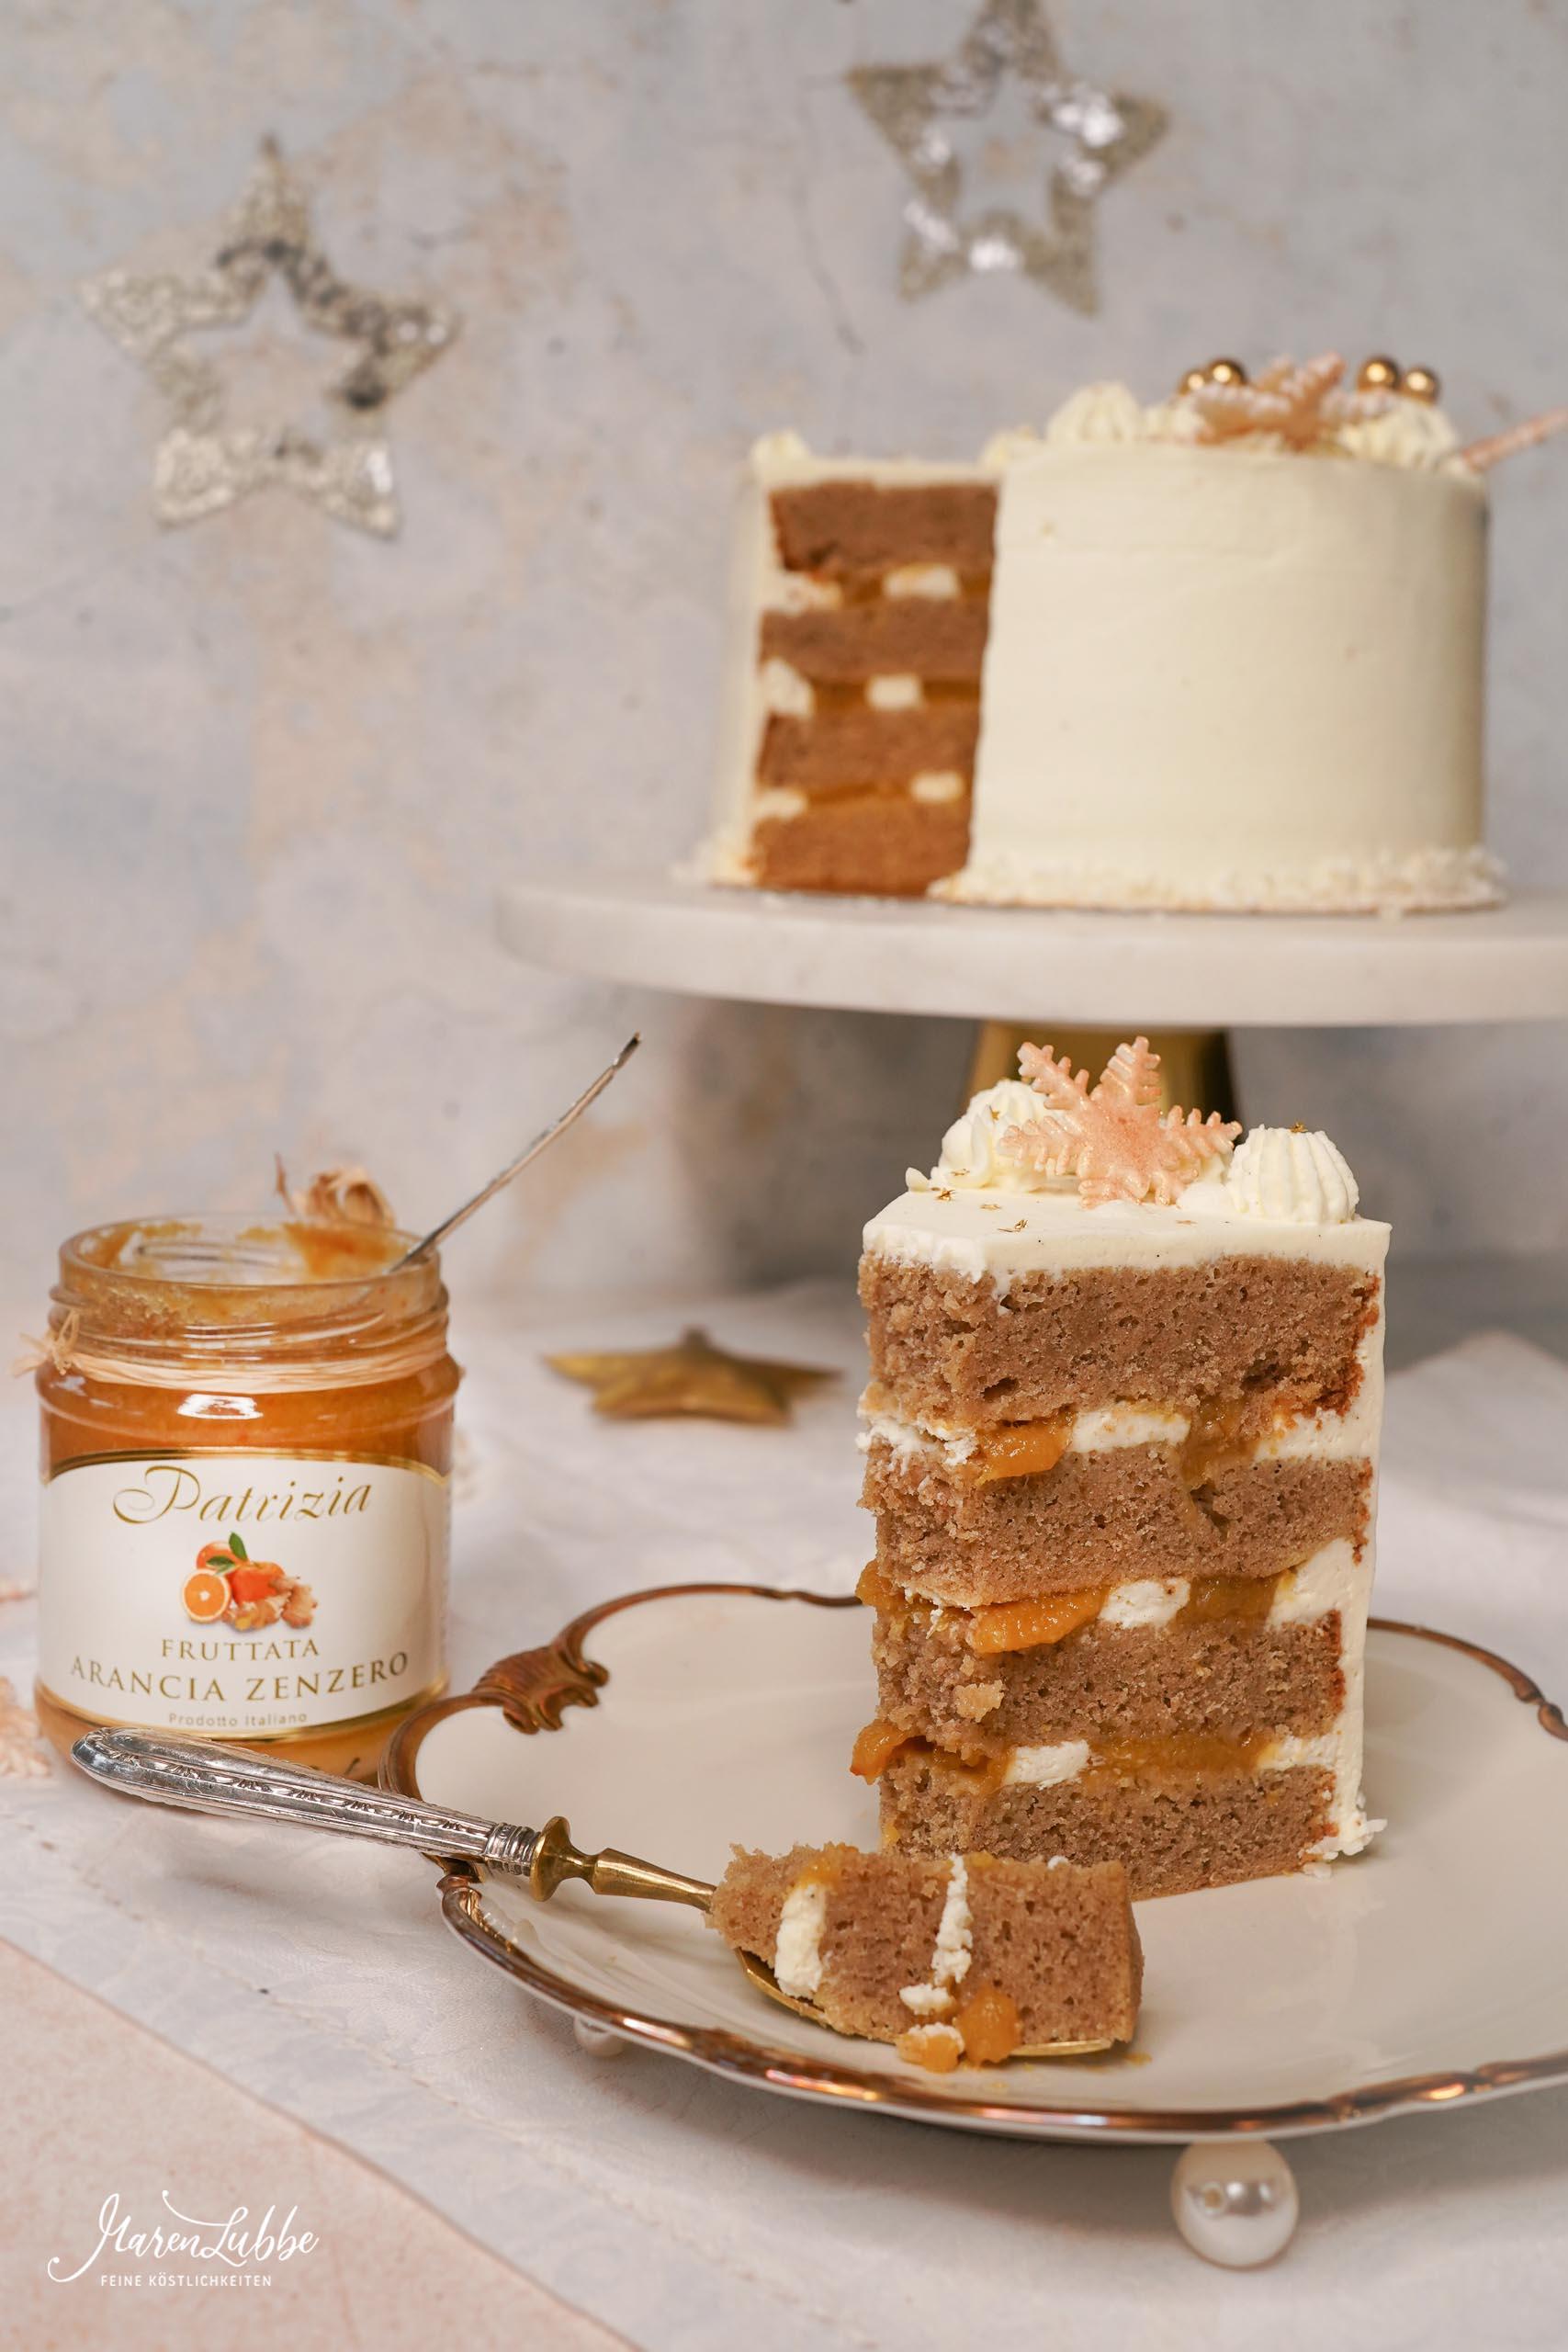 Eggnog-Orangen Torte